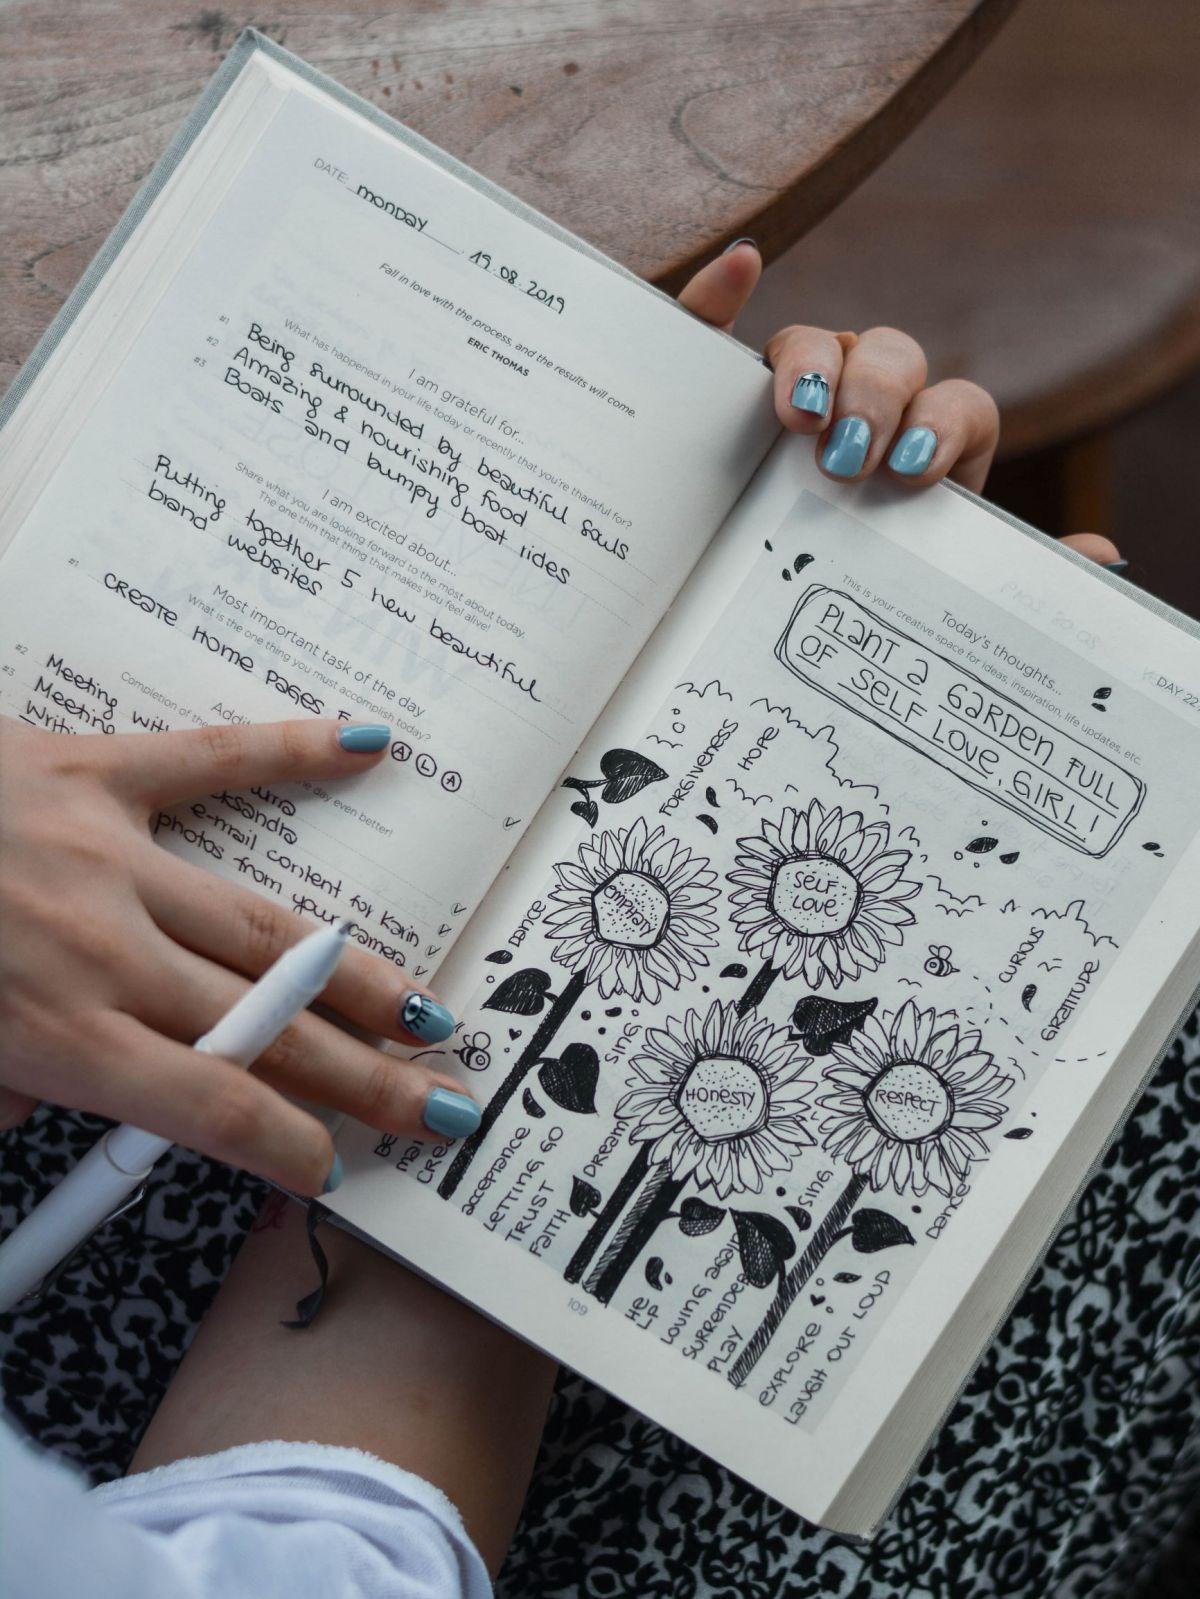 my-life-journal-xPniC9gBr0E-unsplash